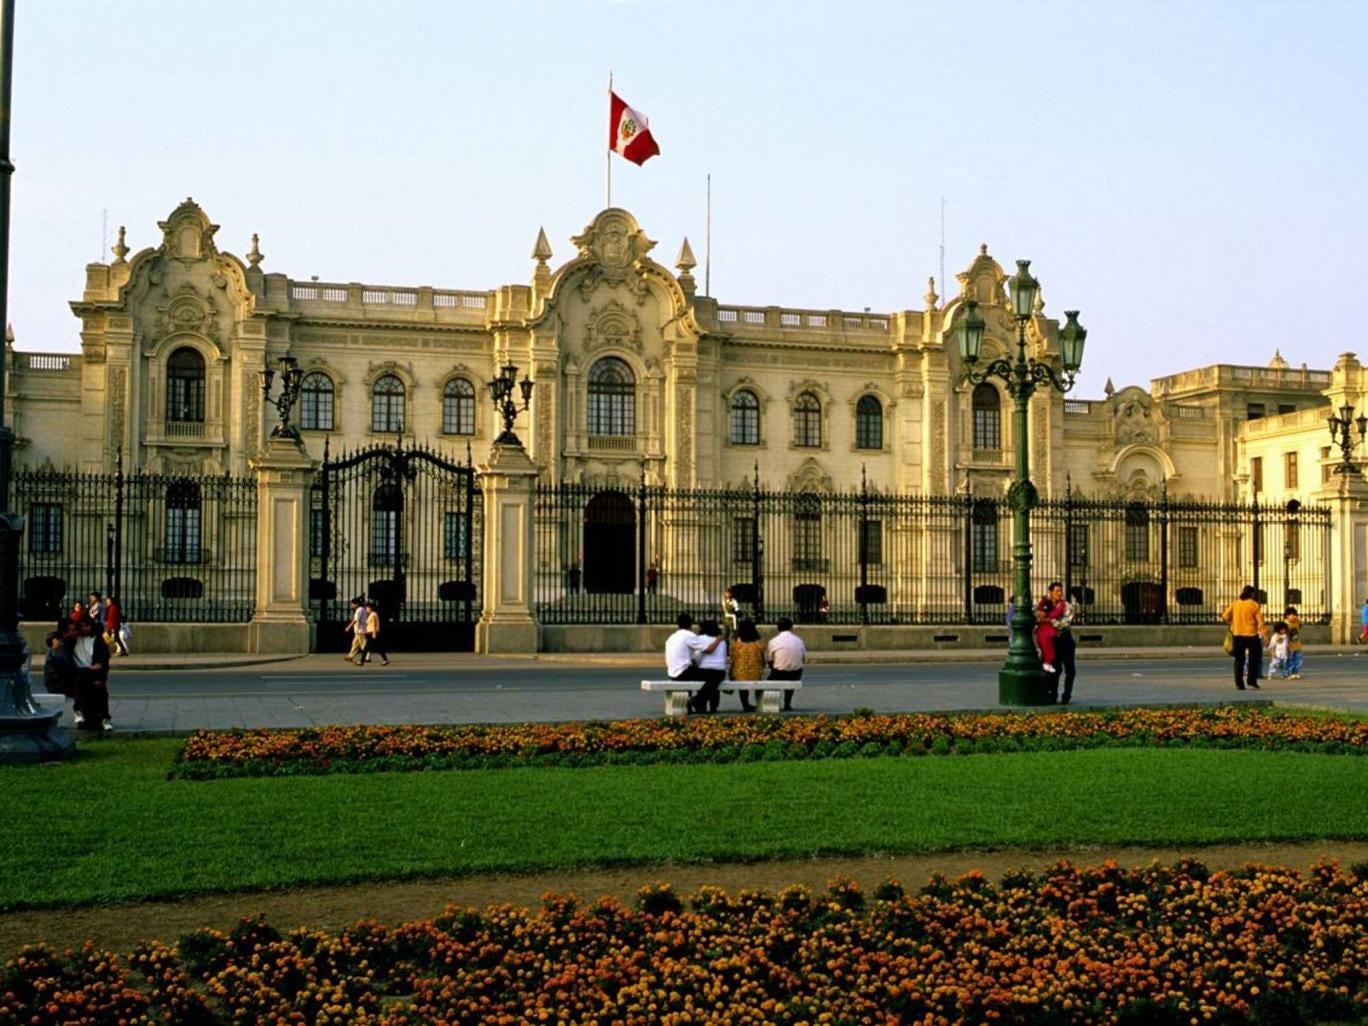 Presidential pad: the stately Palacio del Gobierno in the Plaza Mayor